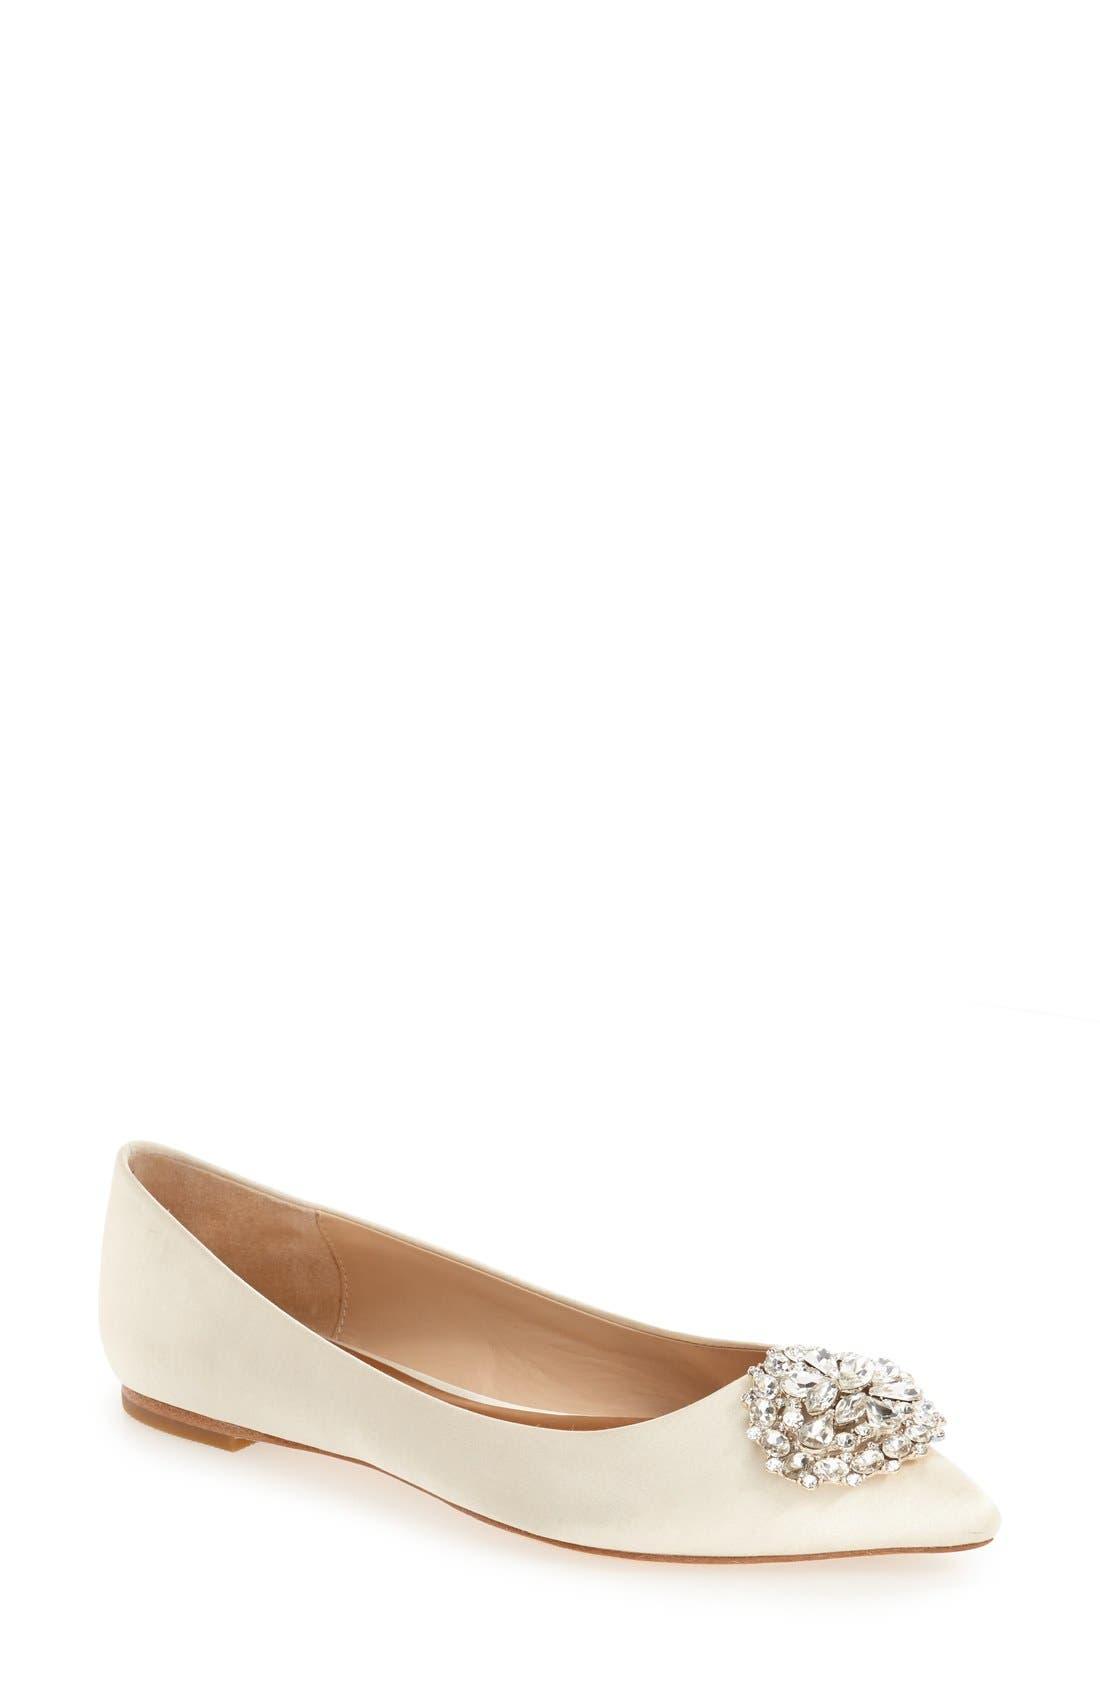 Alternate Image 1 Selected - Badgley Mischka 'Davis' Crystal Embellished Pointy Toe Flat (Women)